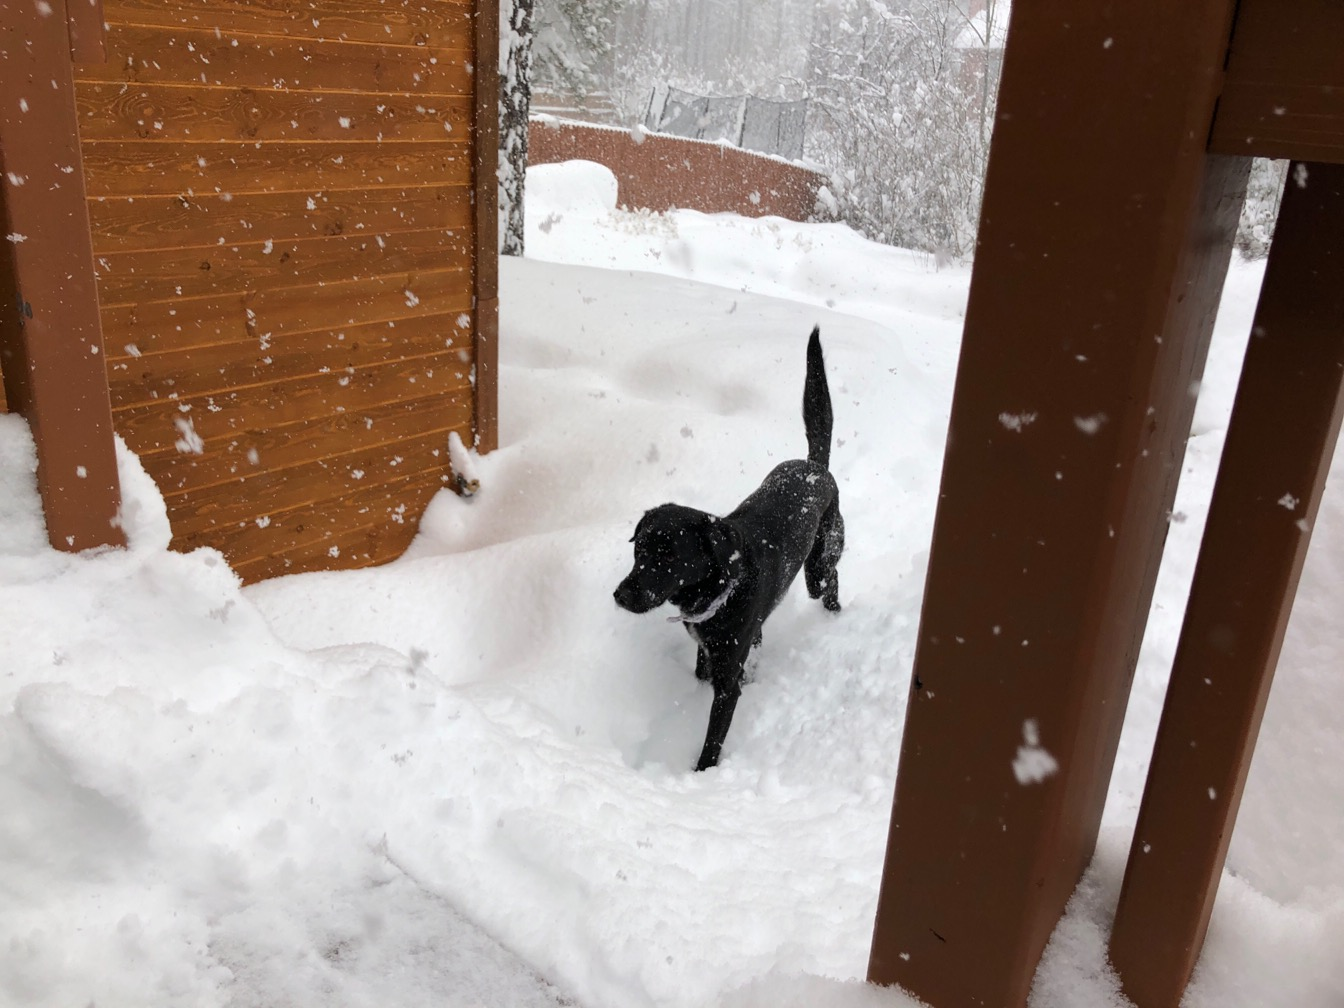 Black dog trotting through very deep snowdrifts